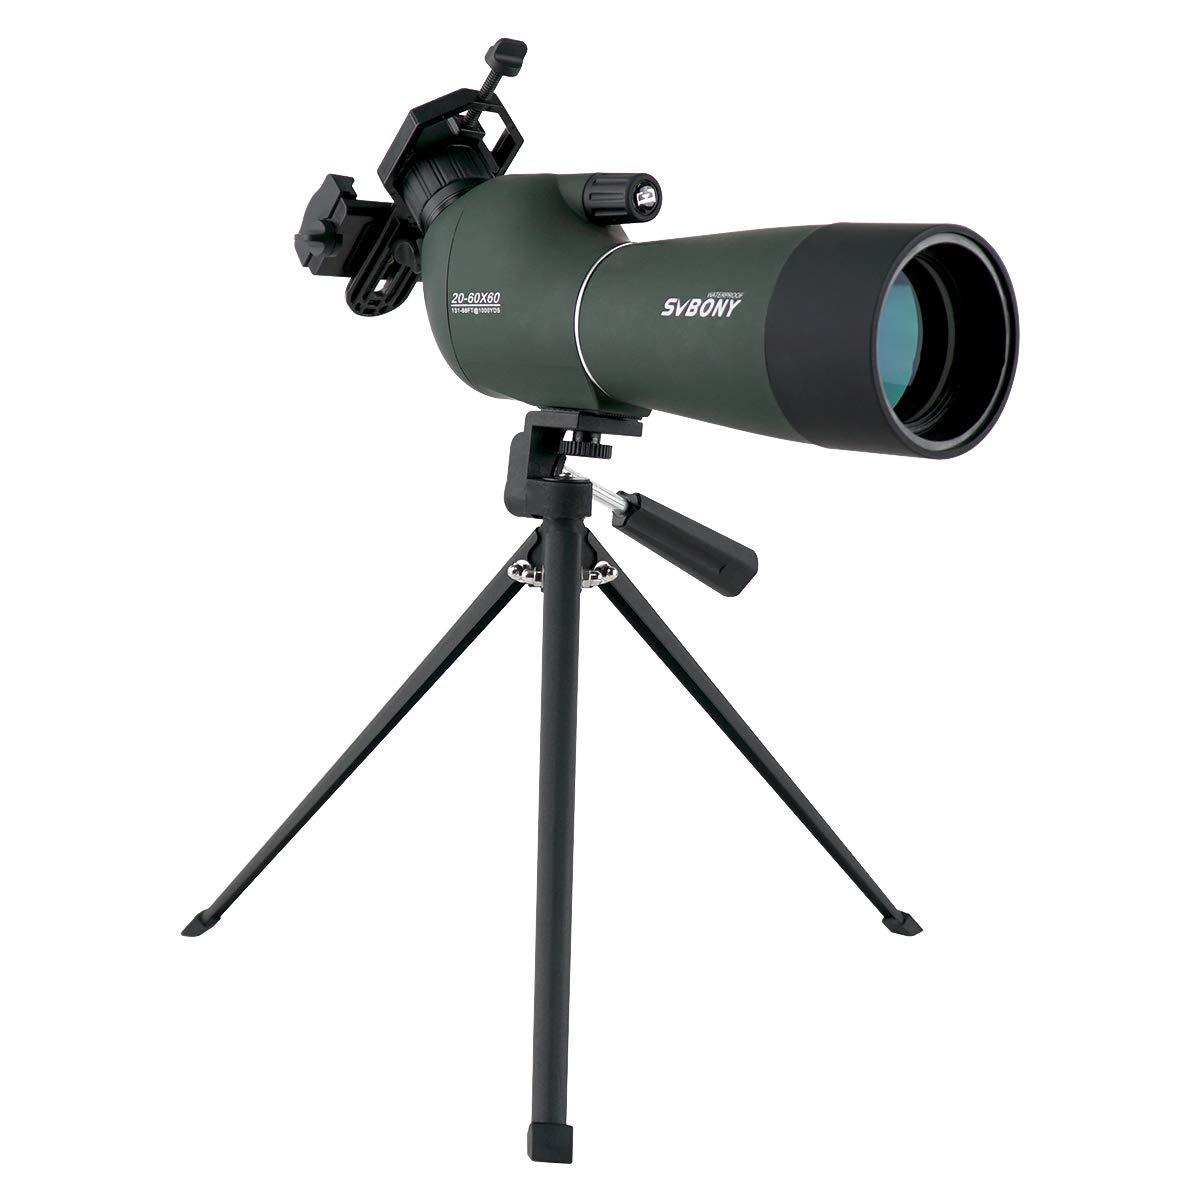 SVBONY SV28 Porro Prism Spotting Scope 20-60x60mm Bird Scopes Shooting Bird Watching 45 Degree Angled Eyepiece Telescope Target Shooting Hunting Bak4 Prism Phone Adapter(20-60x60mm) by SVBONY